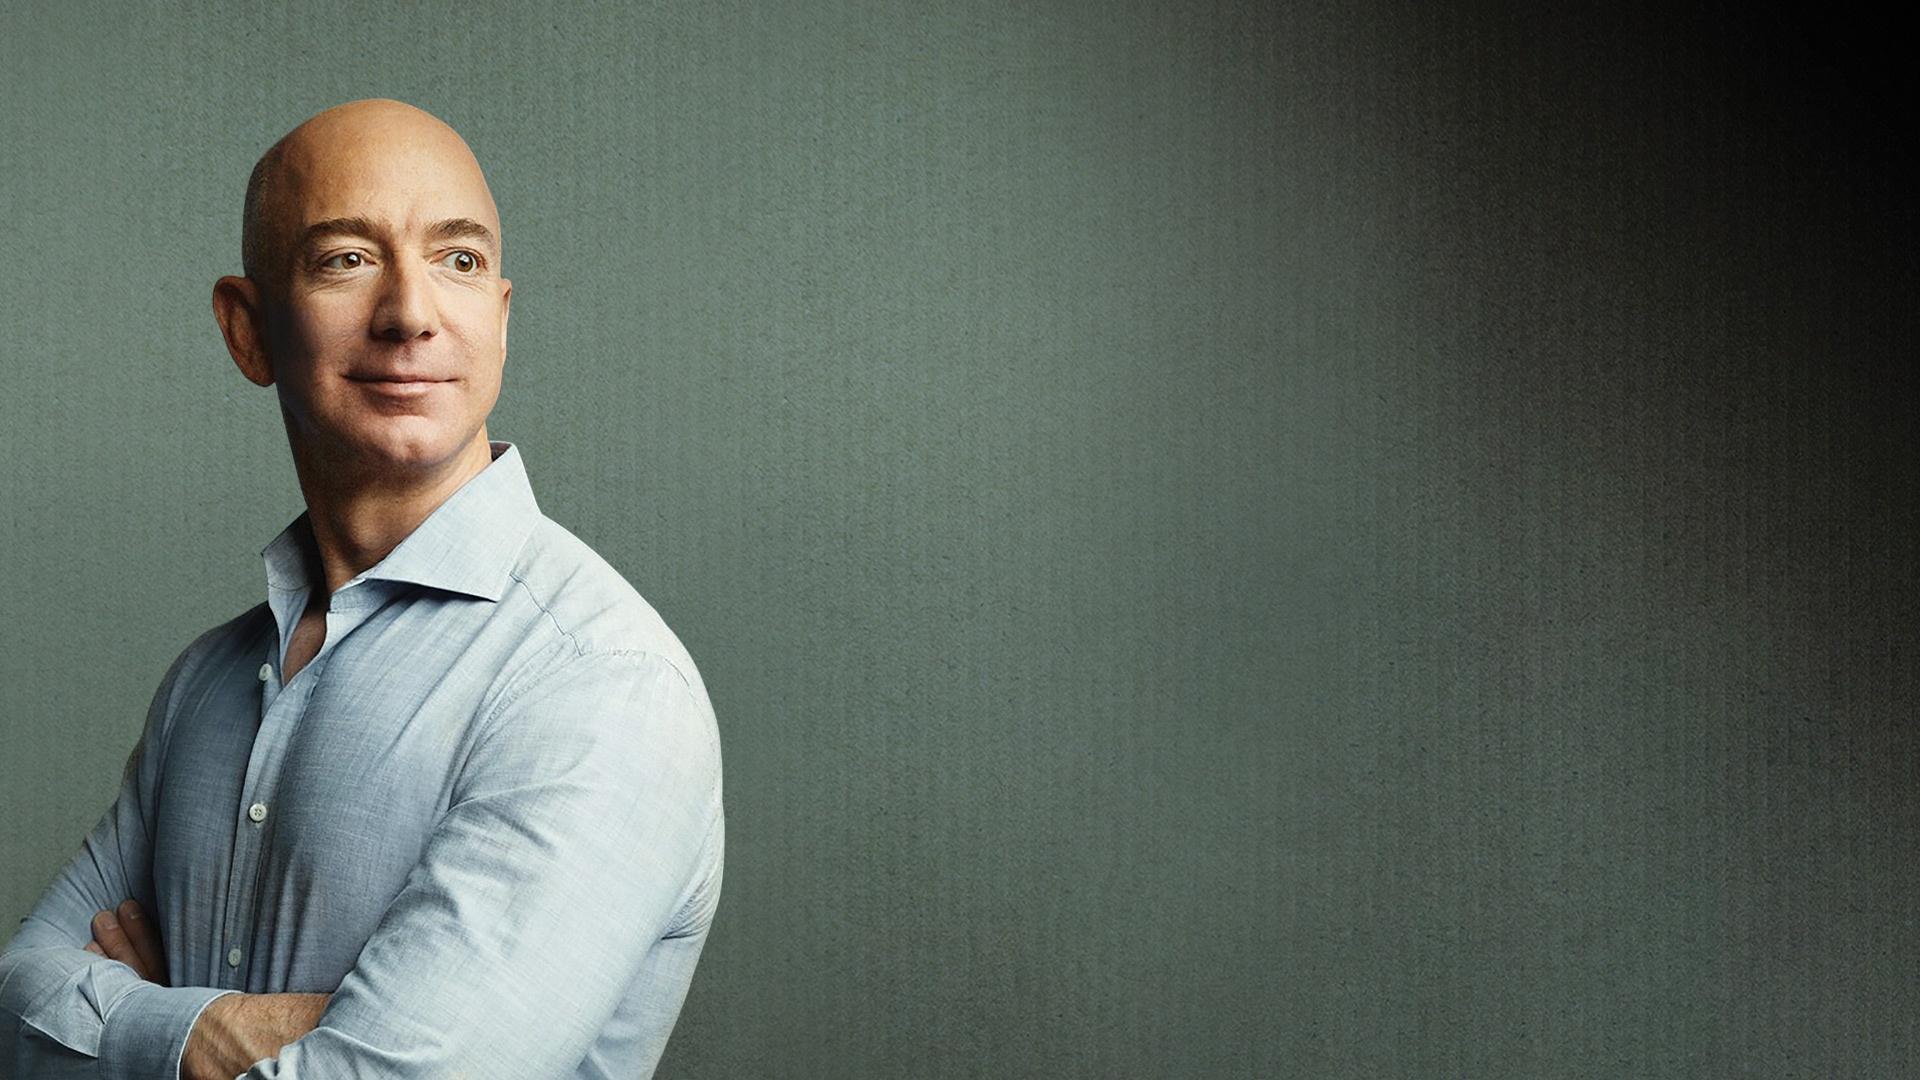 Frontline Amazon Empire The Rise And Reign Of Jeff Bezos Season 2020 Episode 6 Pbs